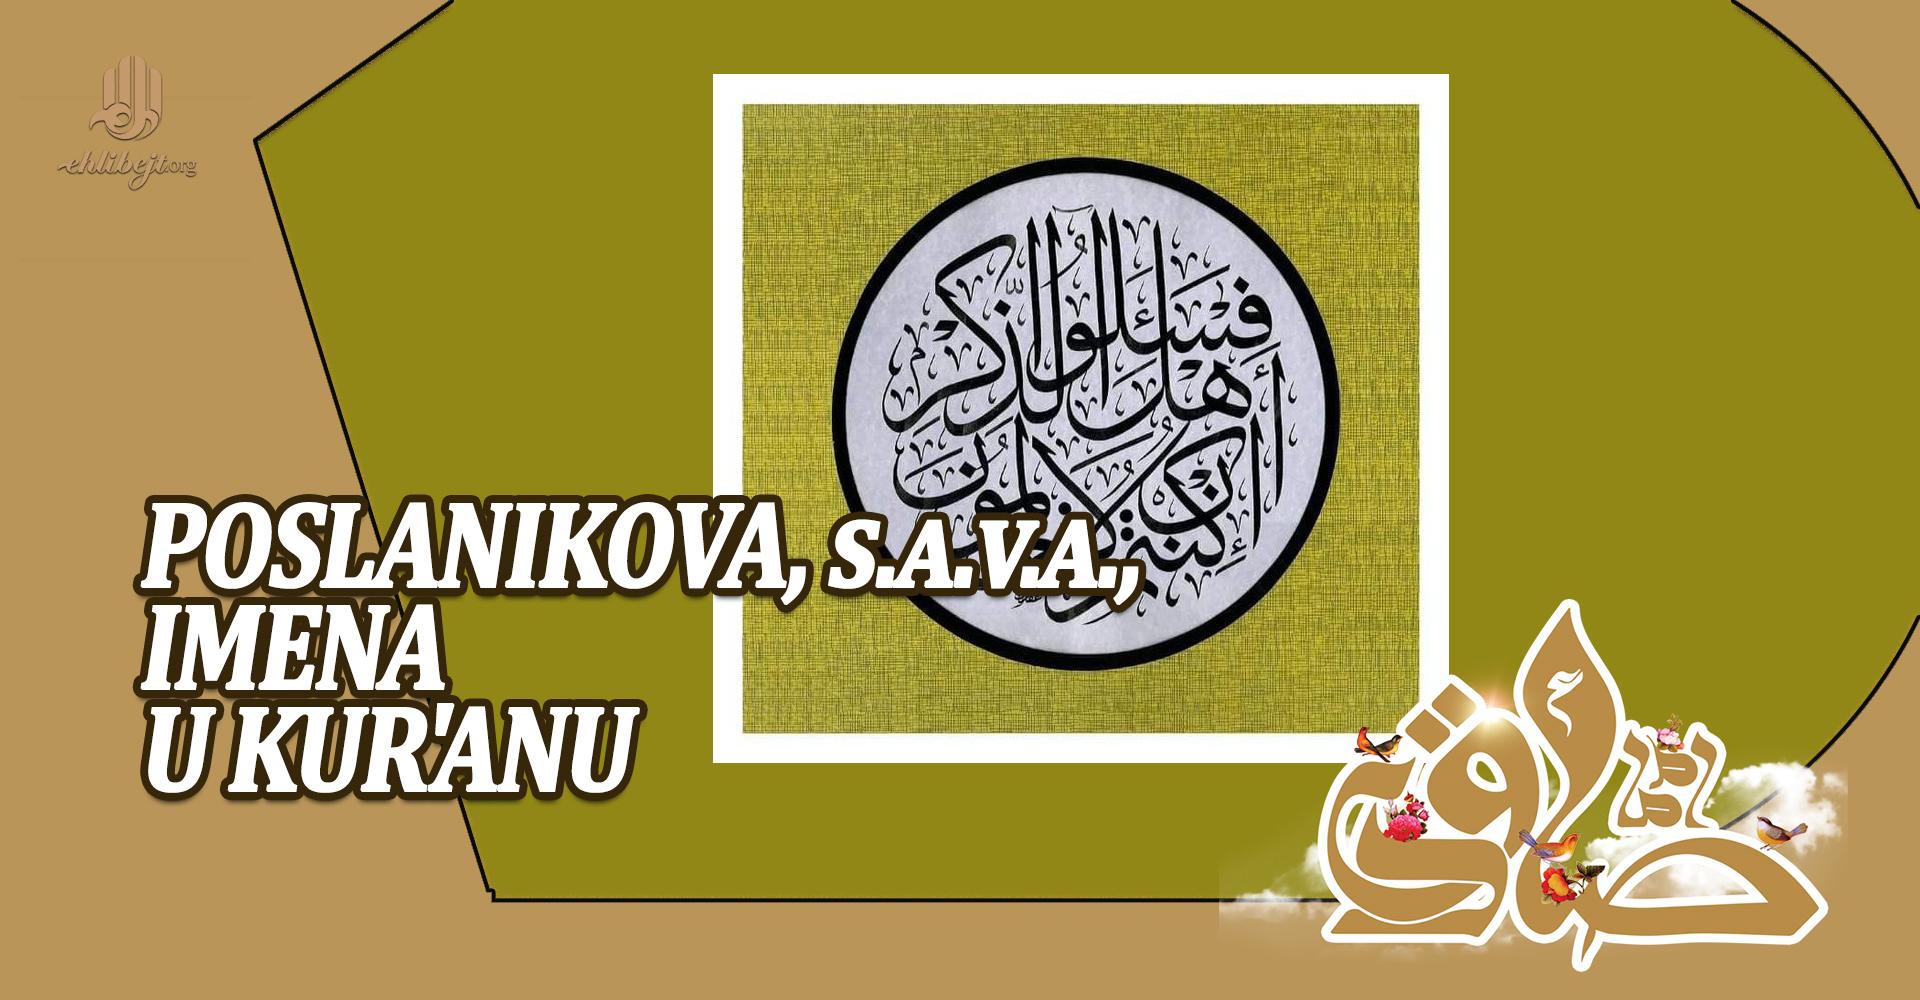 Poslanikova, s.a.v.a., imena u Kur'anu